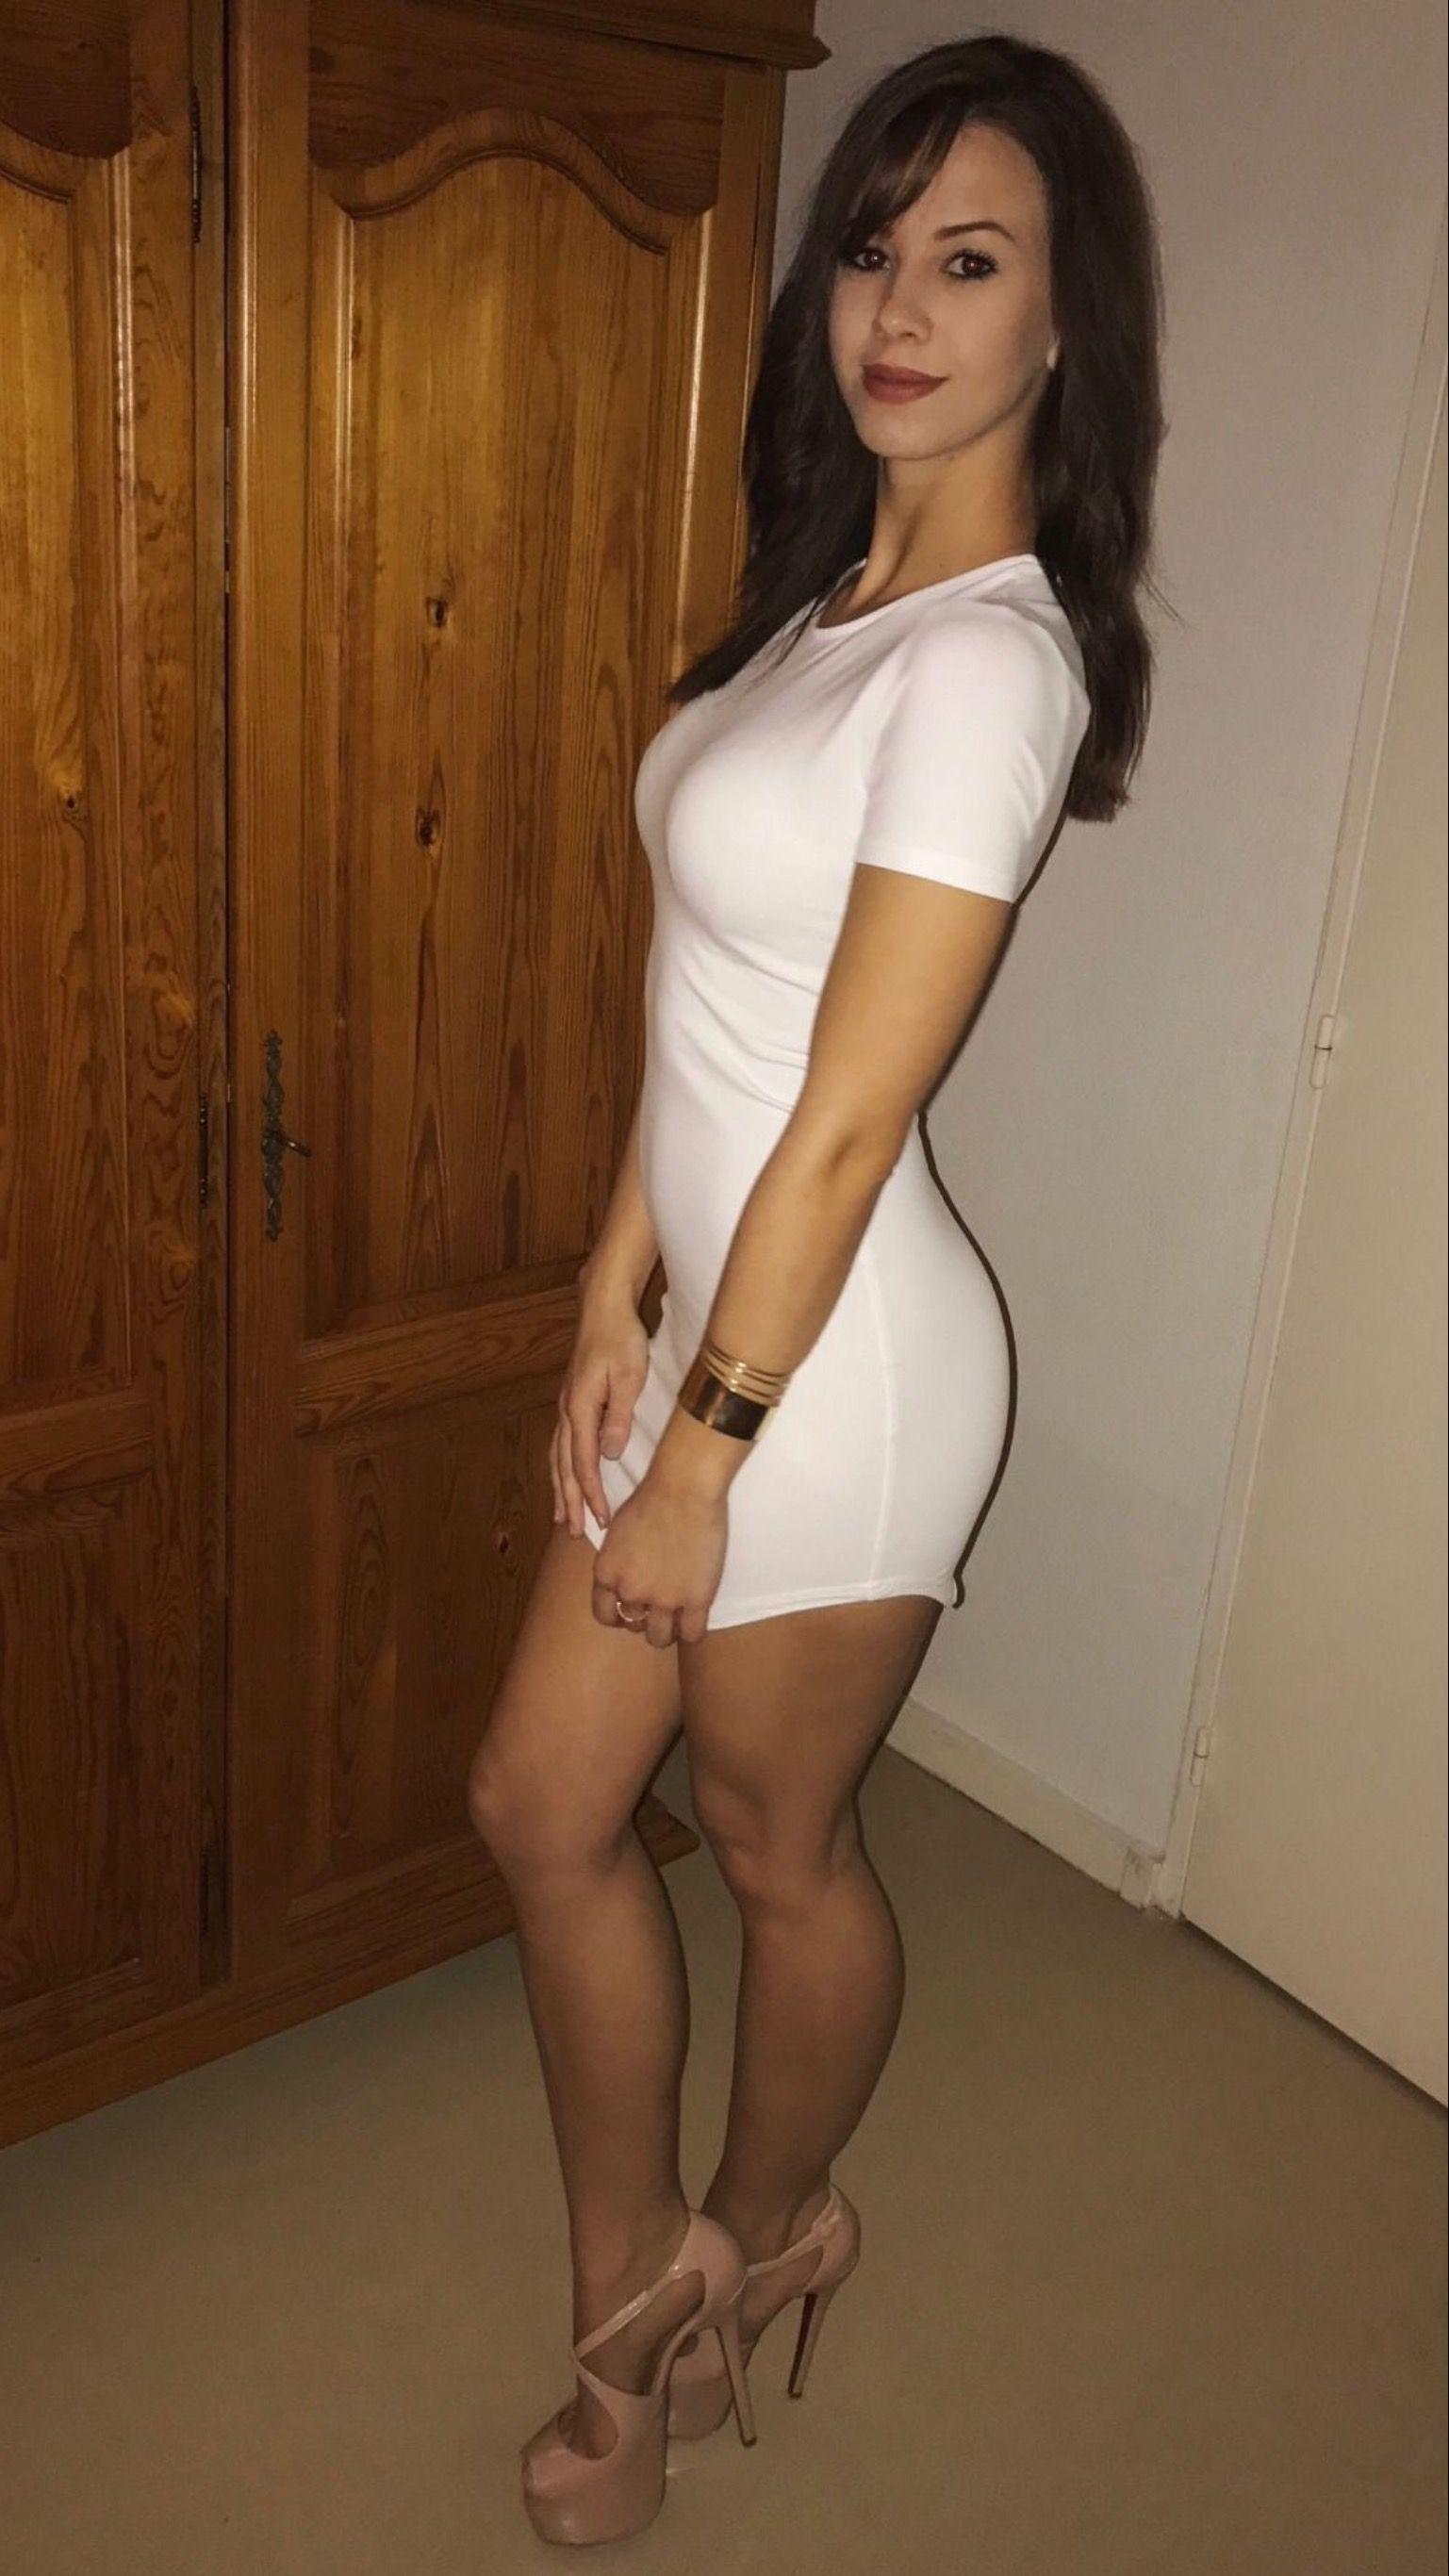 harter sex crossdresser in nylons